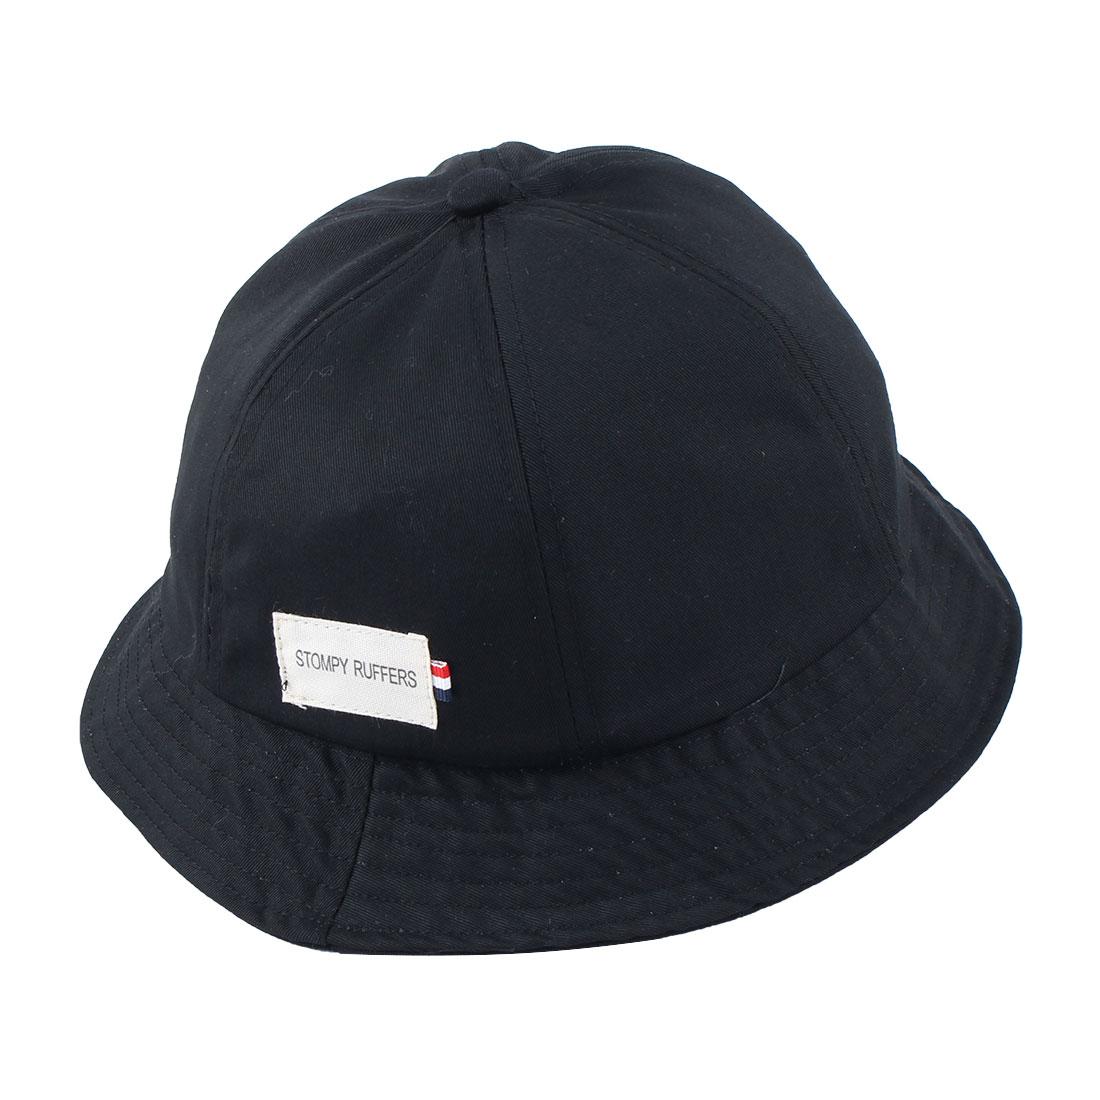 Fisherman Cotton Blends Climbing Travelling Wide Brim Protector Summer Cap Fishing Hat Black